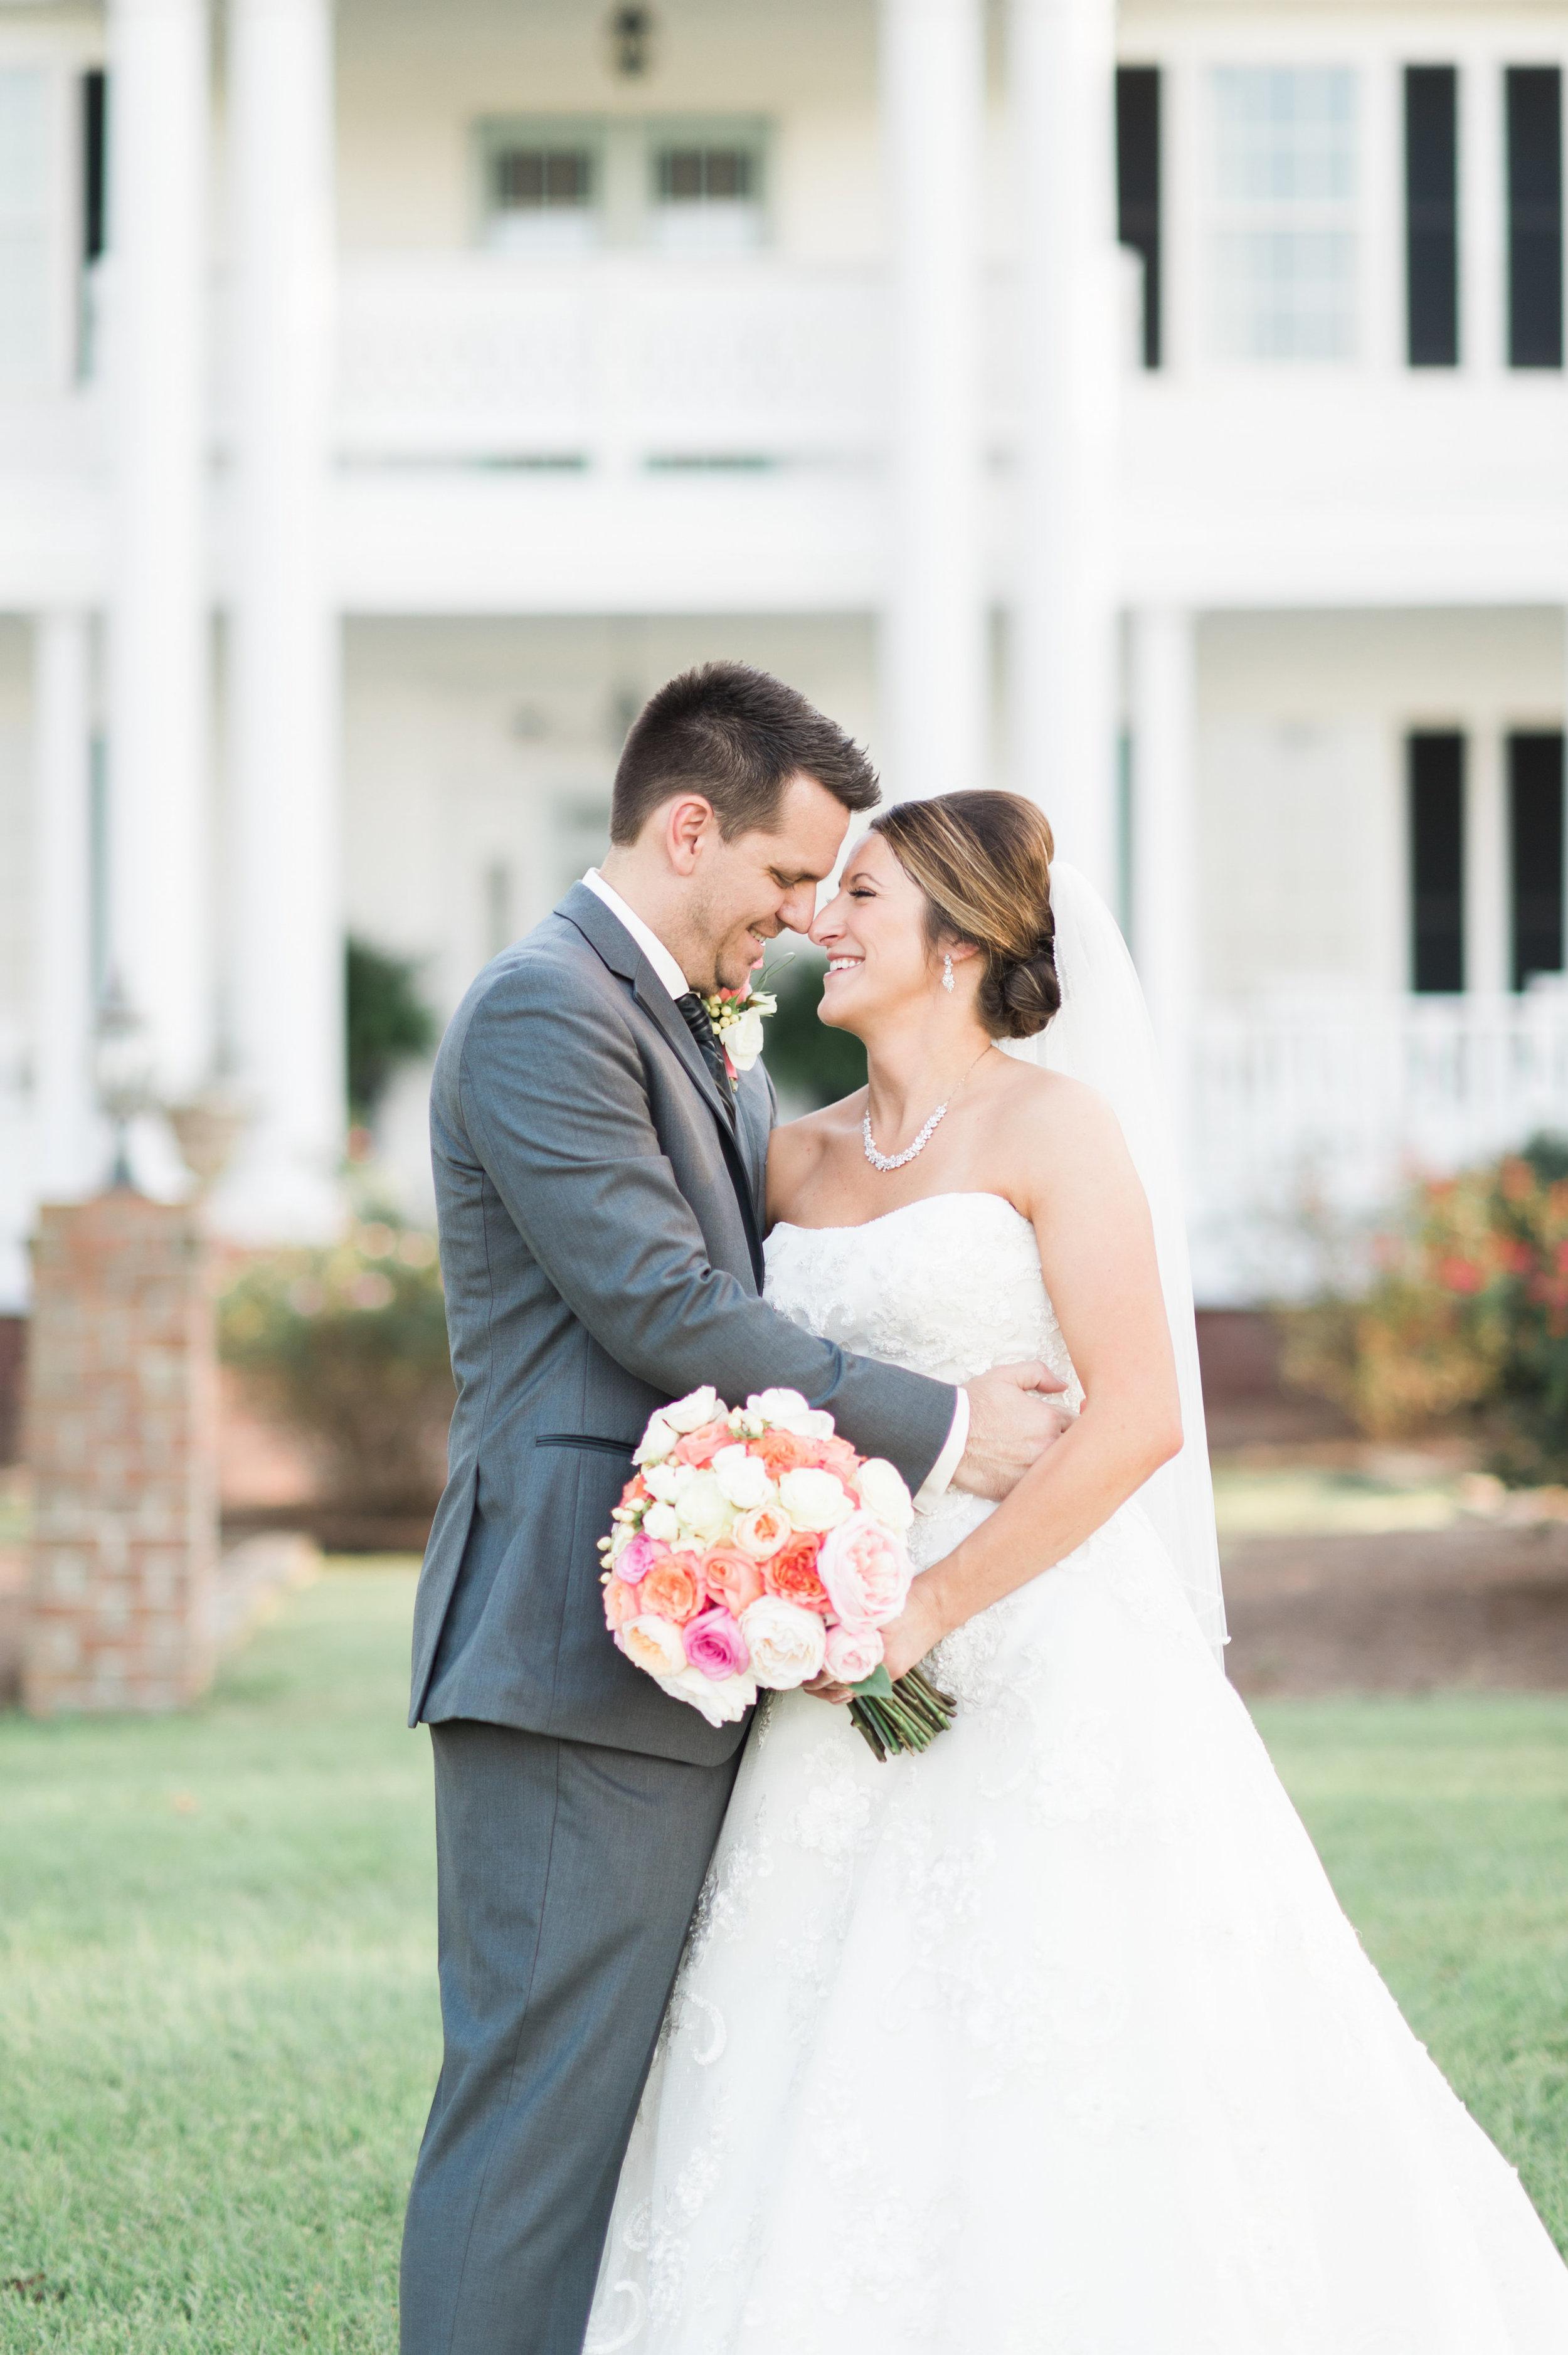 Danielle and Butch s Wedding-Photographer s Favorites-0352.jpg